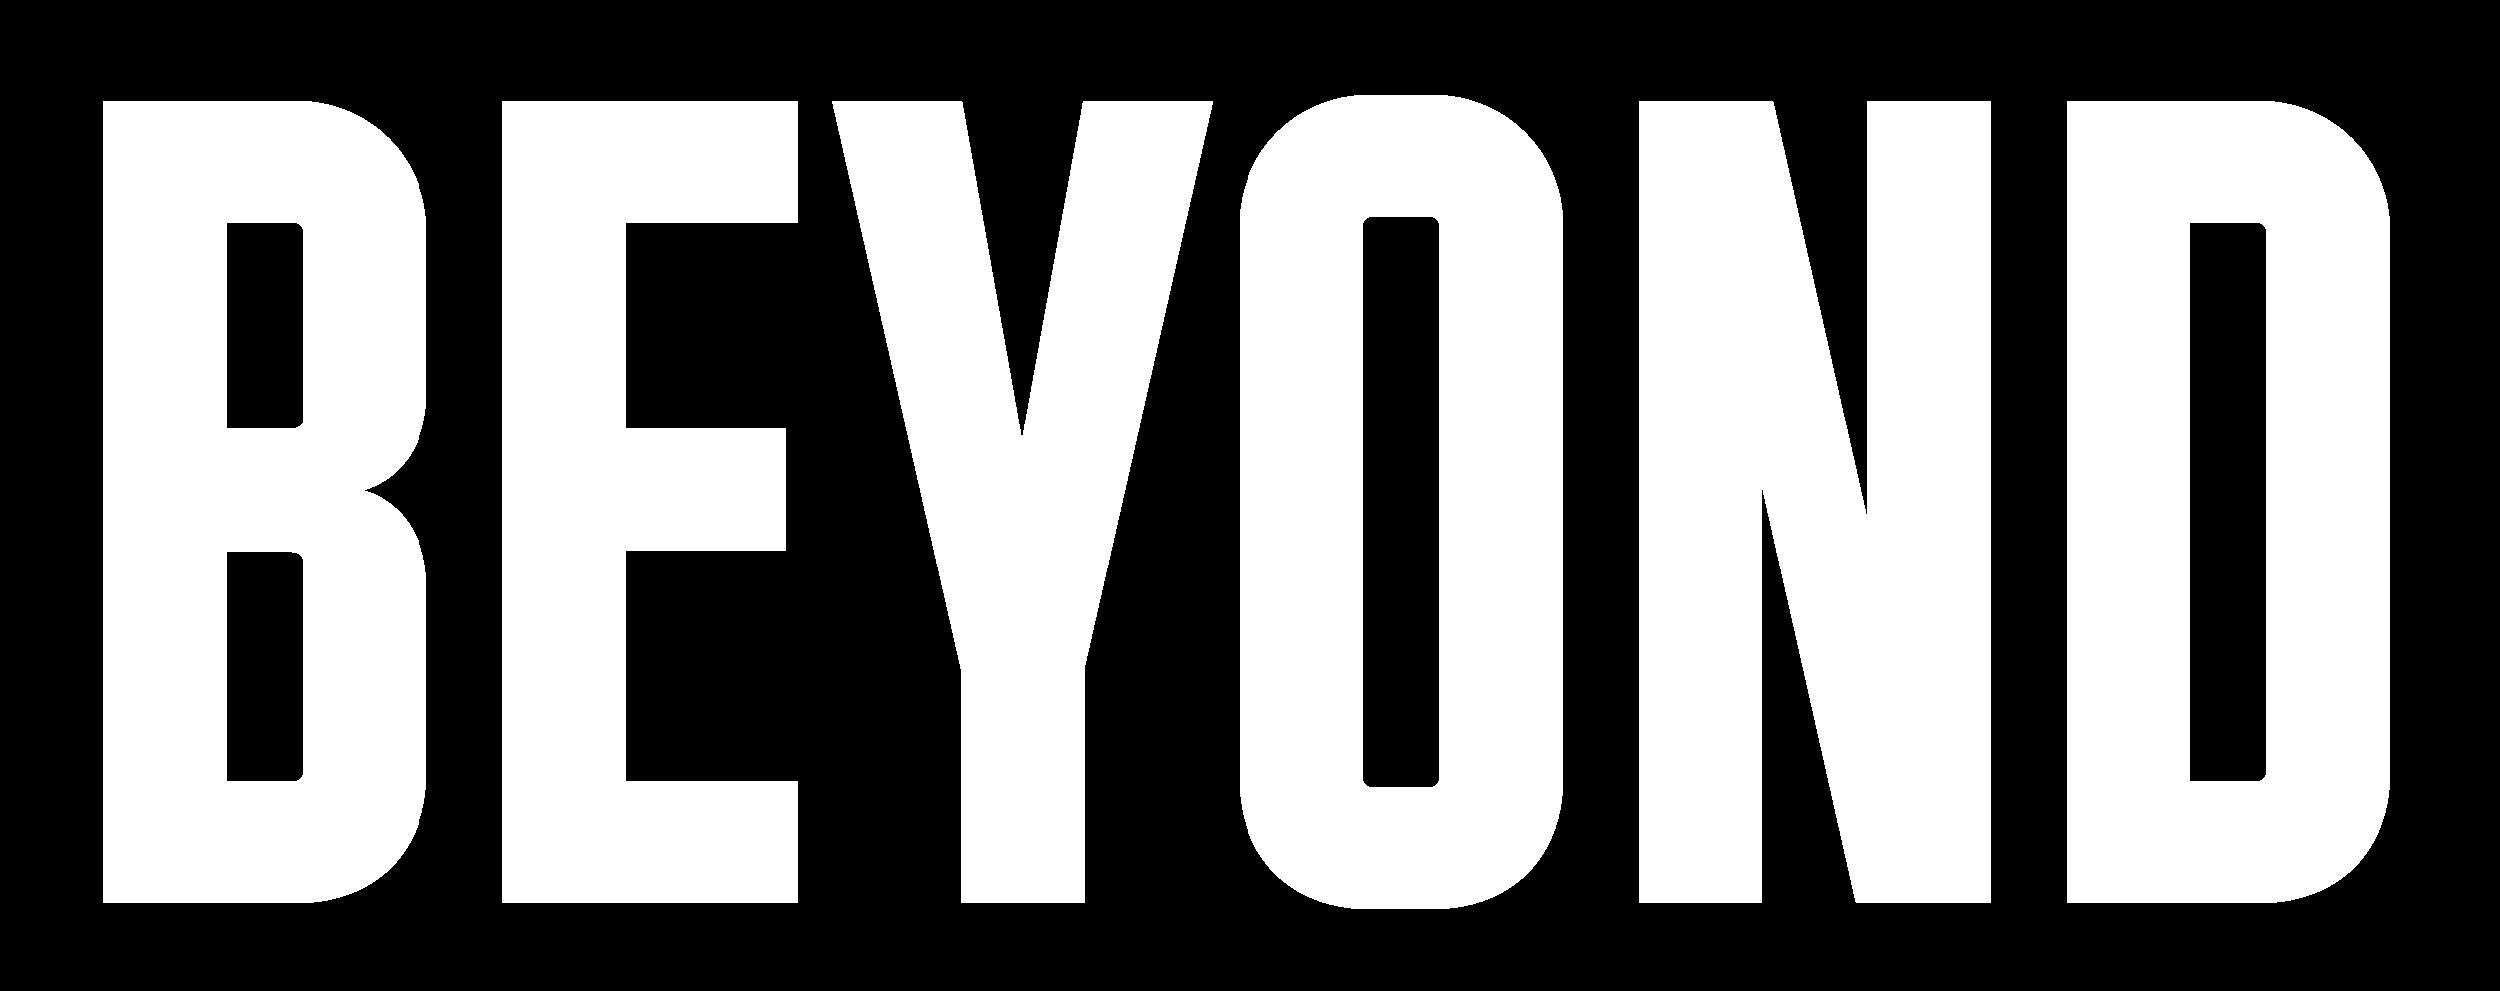 Beyond_White.png